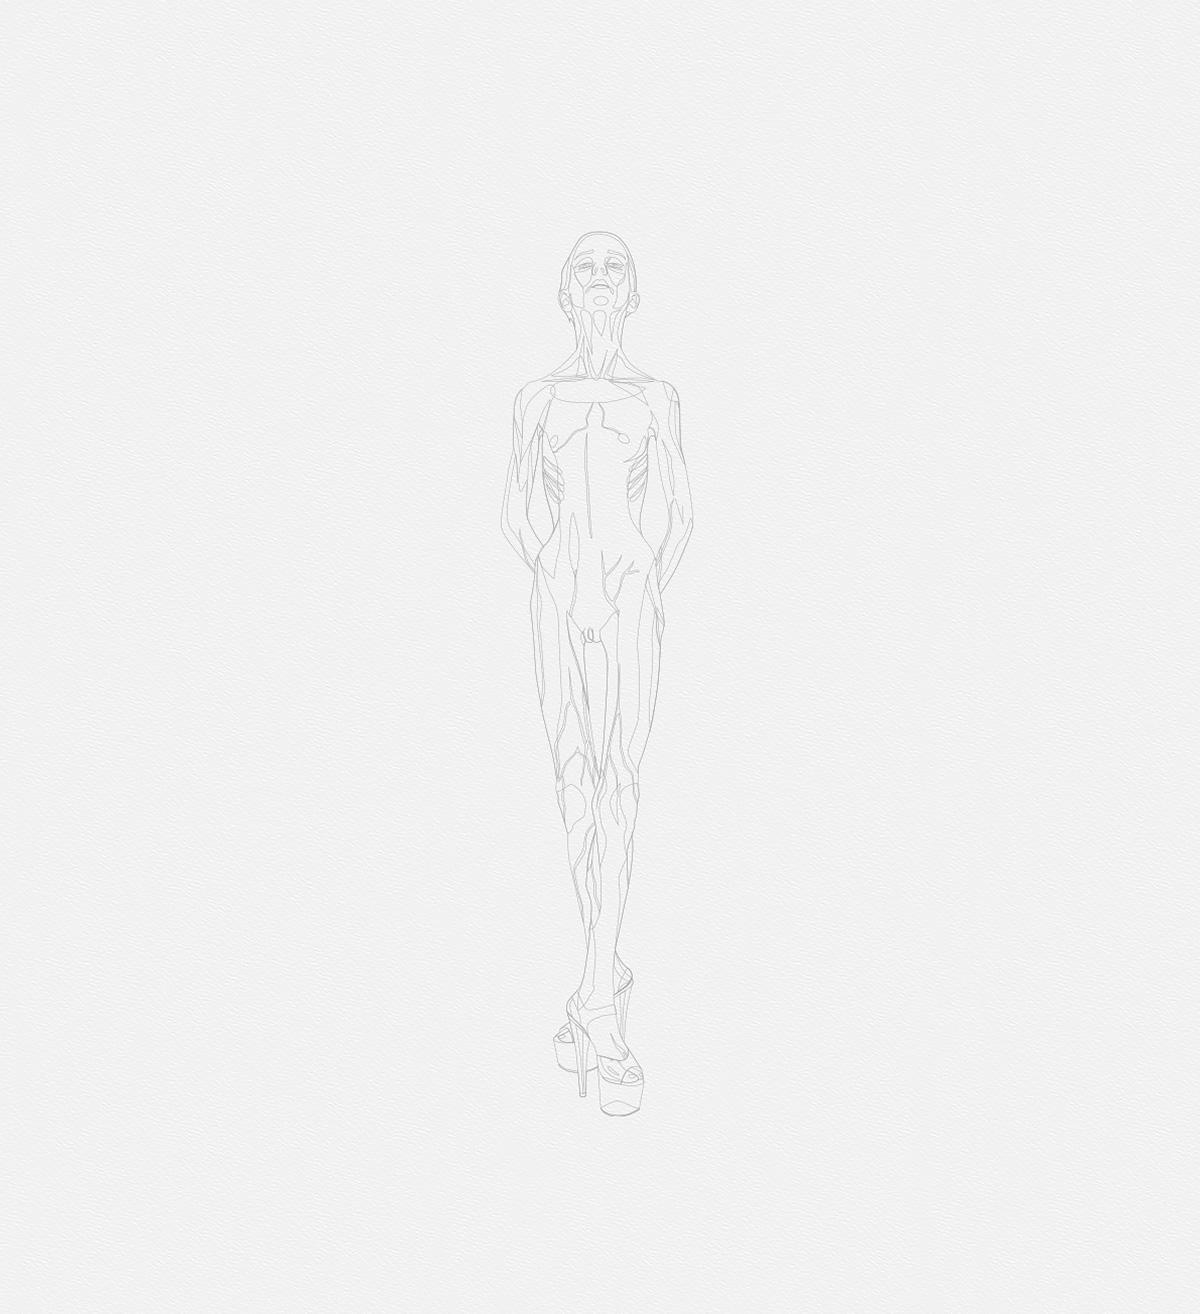 150 2016 la petite danseuse drawbot 001 resume high tty art - Resume - High Definition